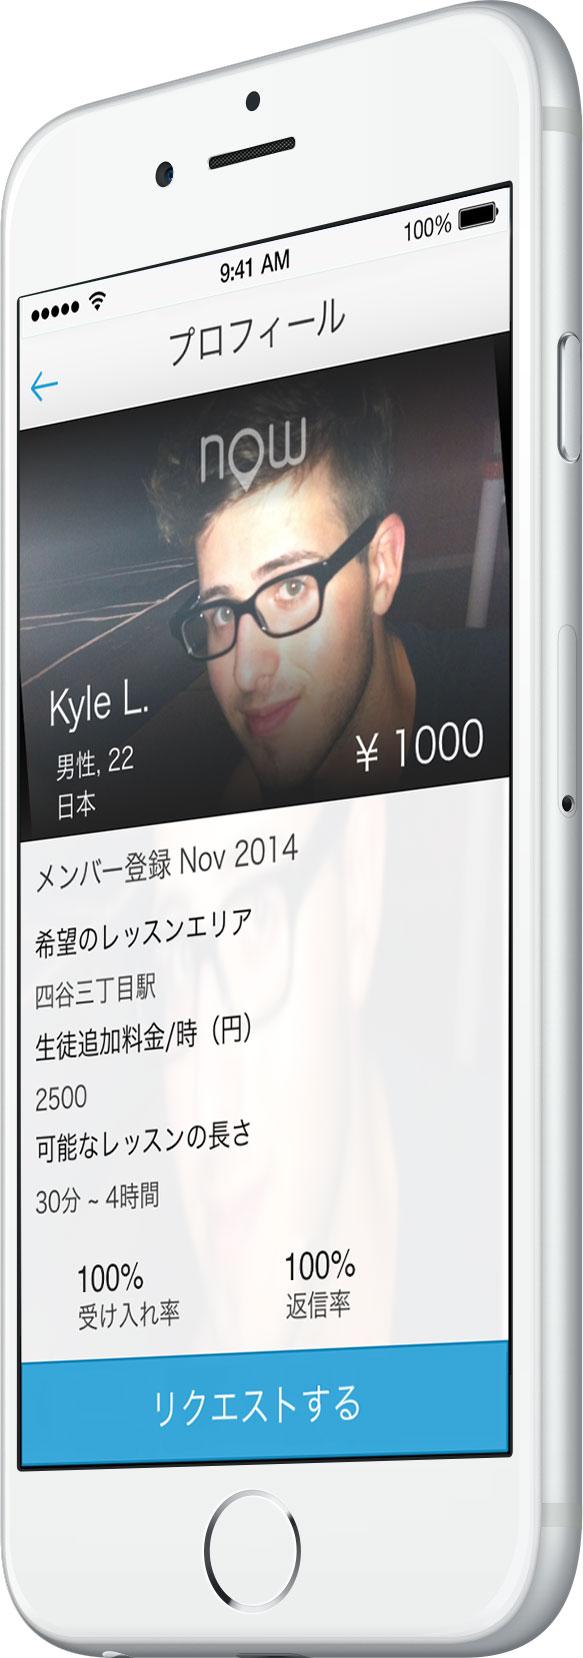 teacher_Kyle_side.jpg